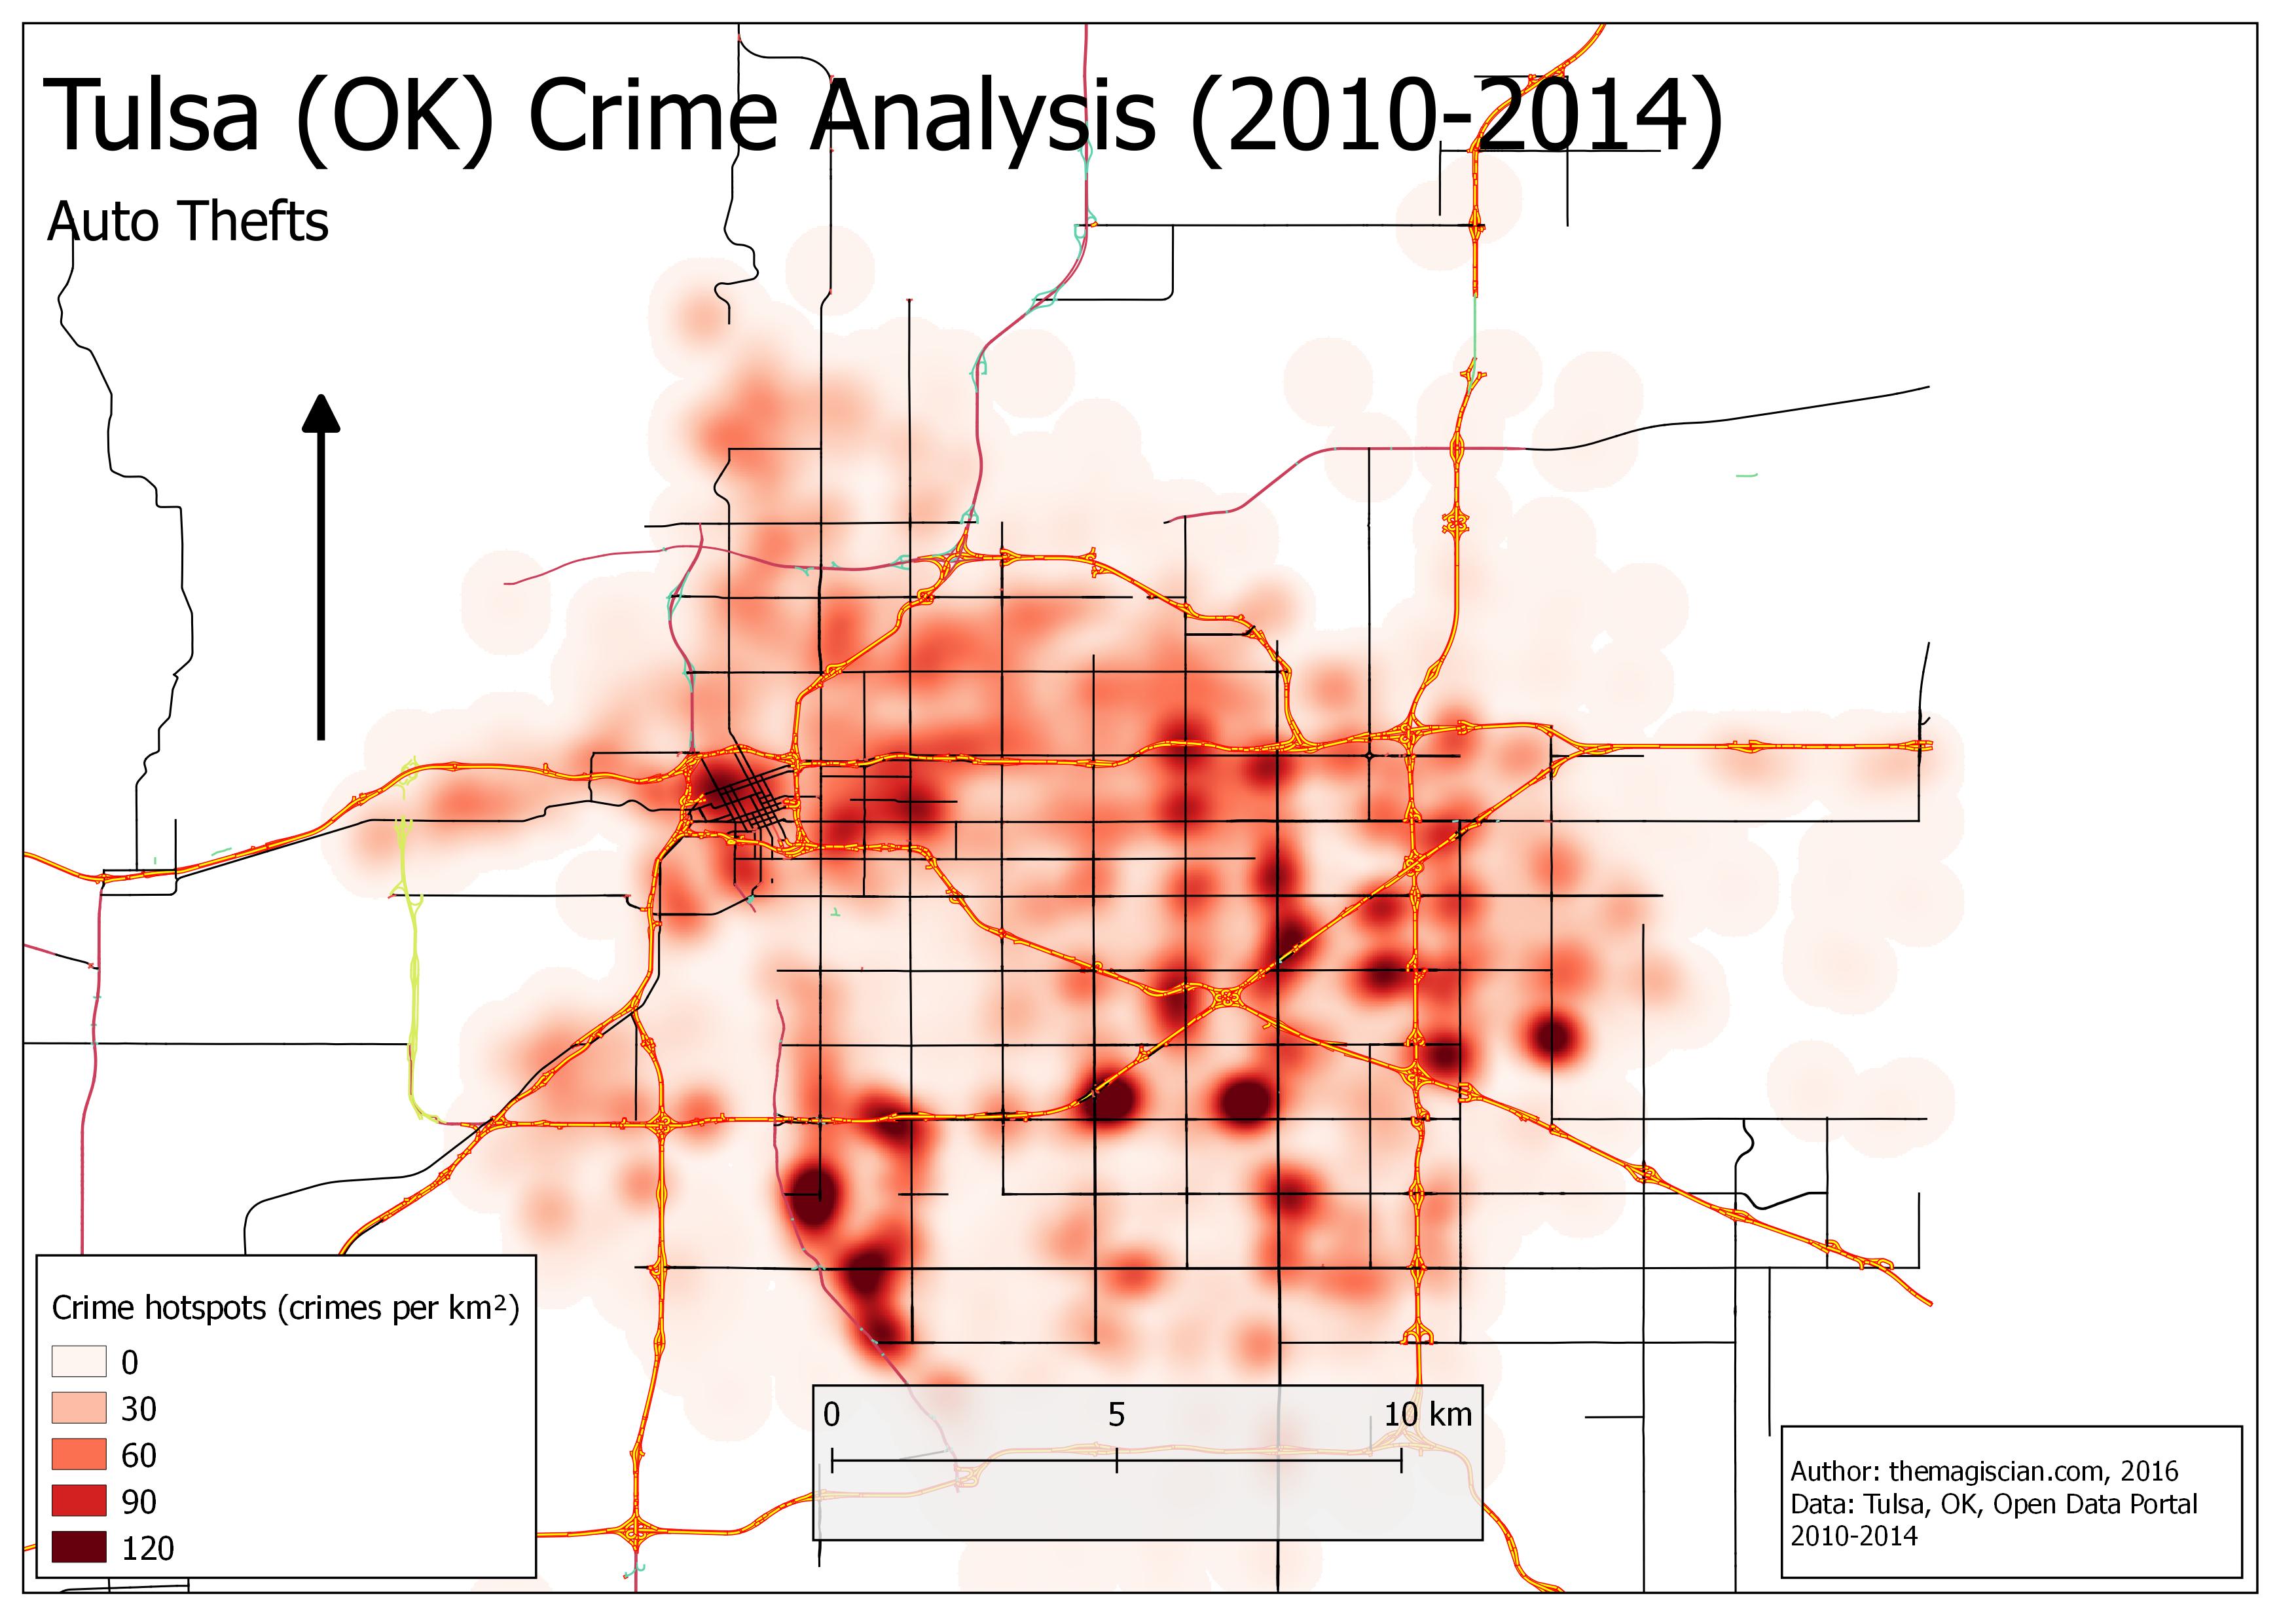 Auto thefts Hotspots (2010-2014)